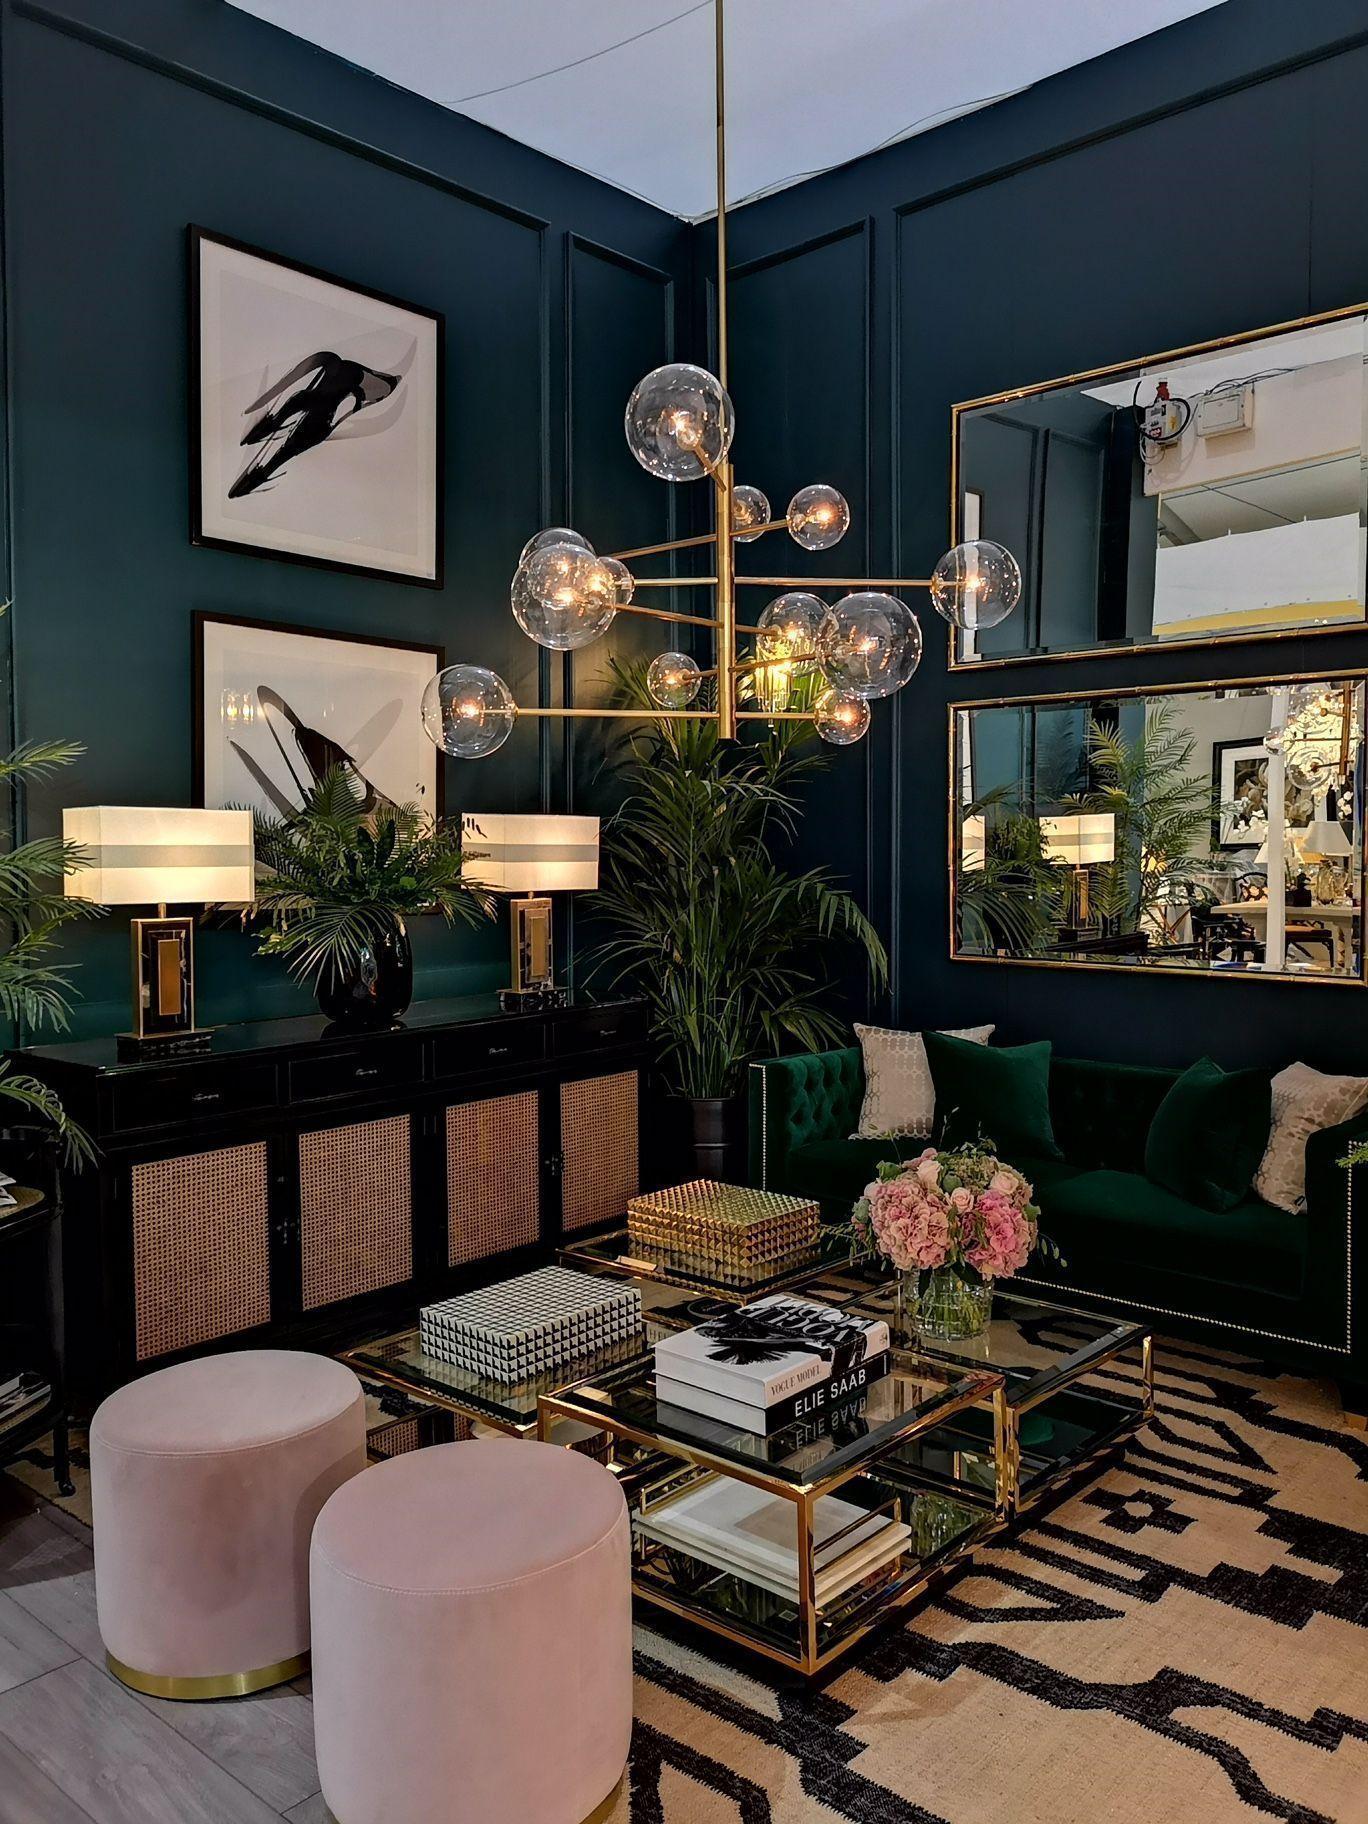 40 perfect lighting decor ideas for living room design on extraordinary living room ideas with lighting id=22115